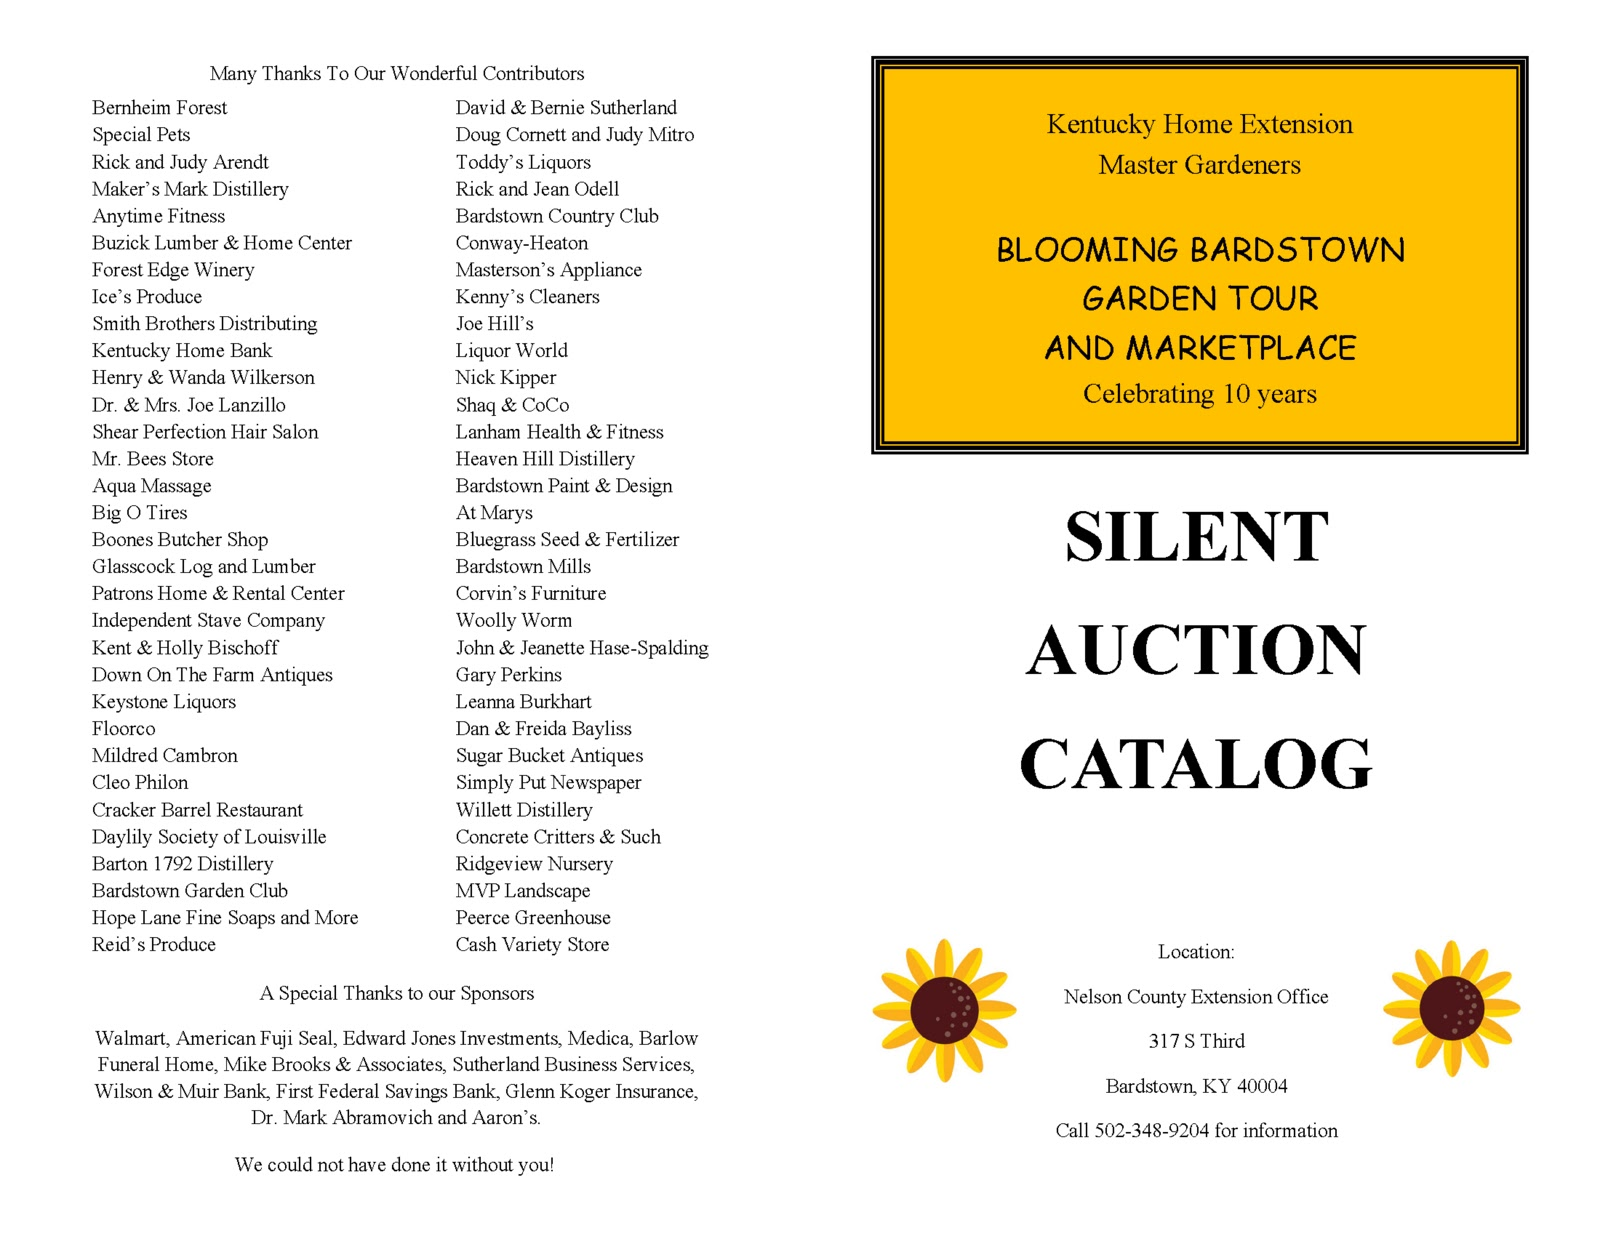 silent auction catalog template kentucky home gardens blooming bardstown garden tour